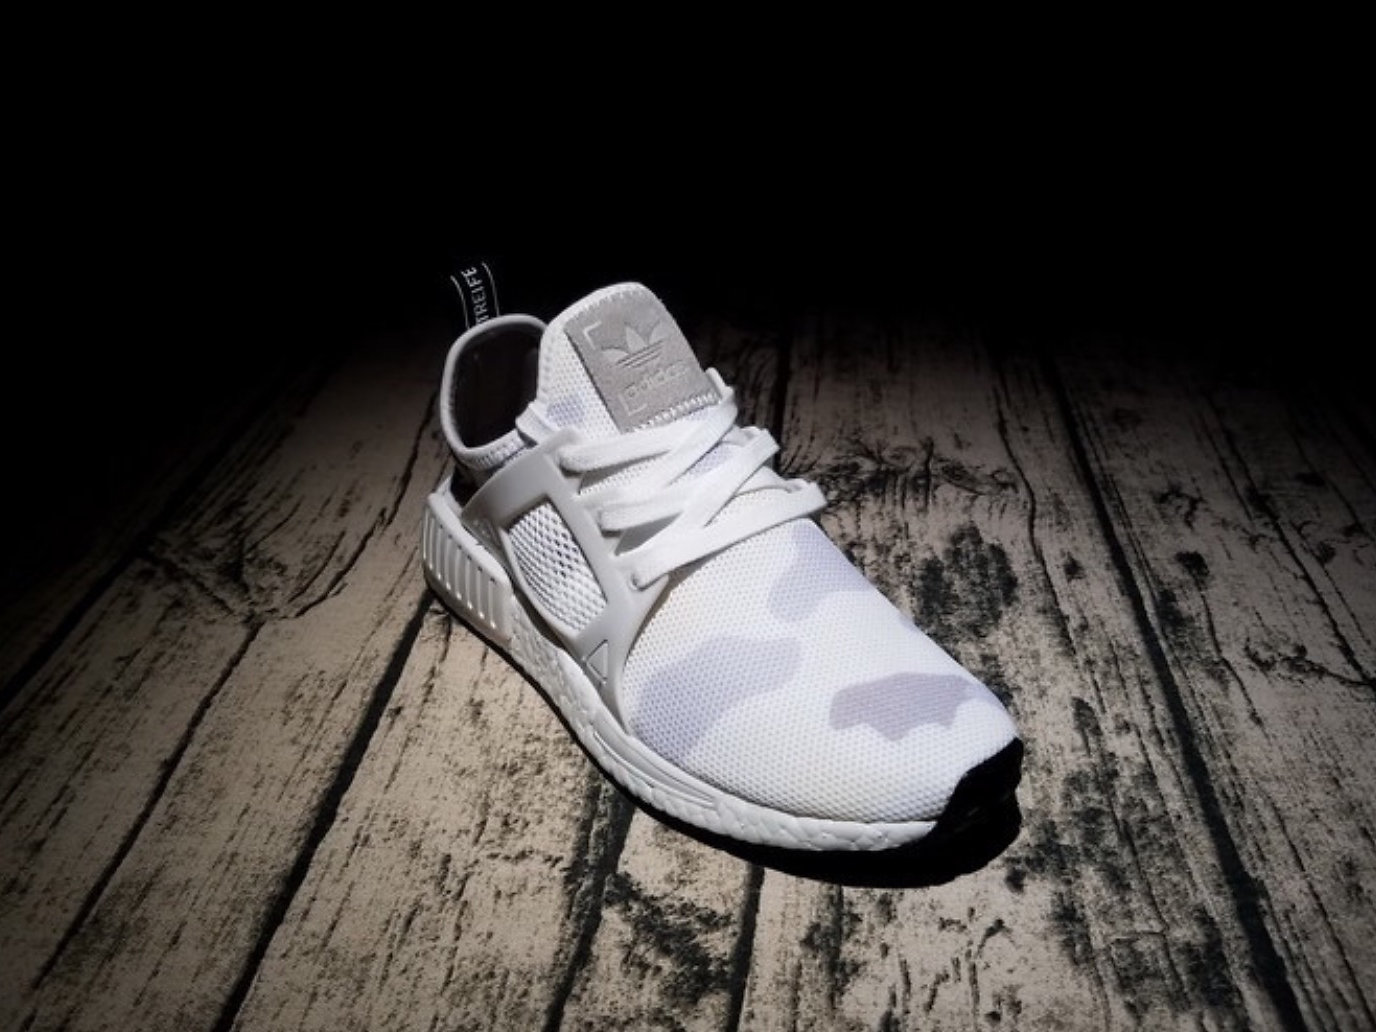 Adidas x mastermind japan mmj nmd xr1 ba9726 US 12.5 (#1120854